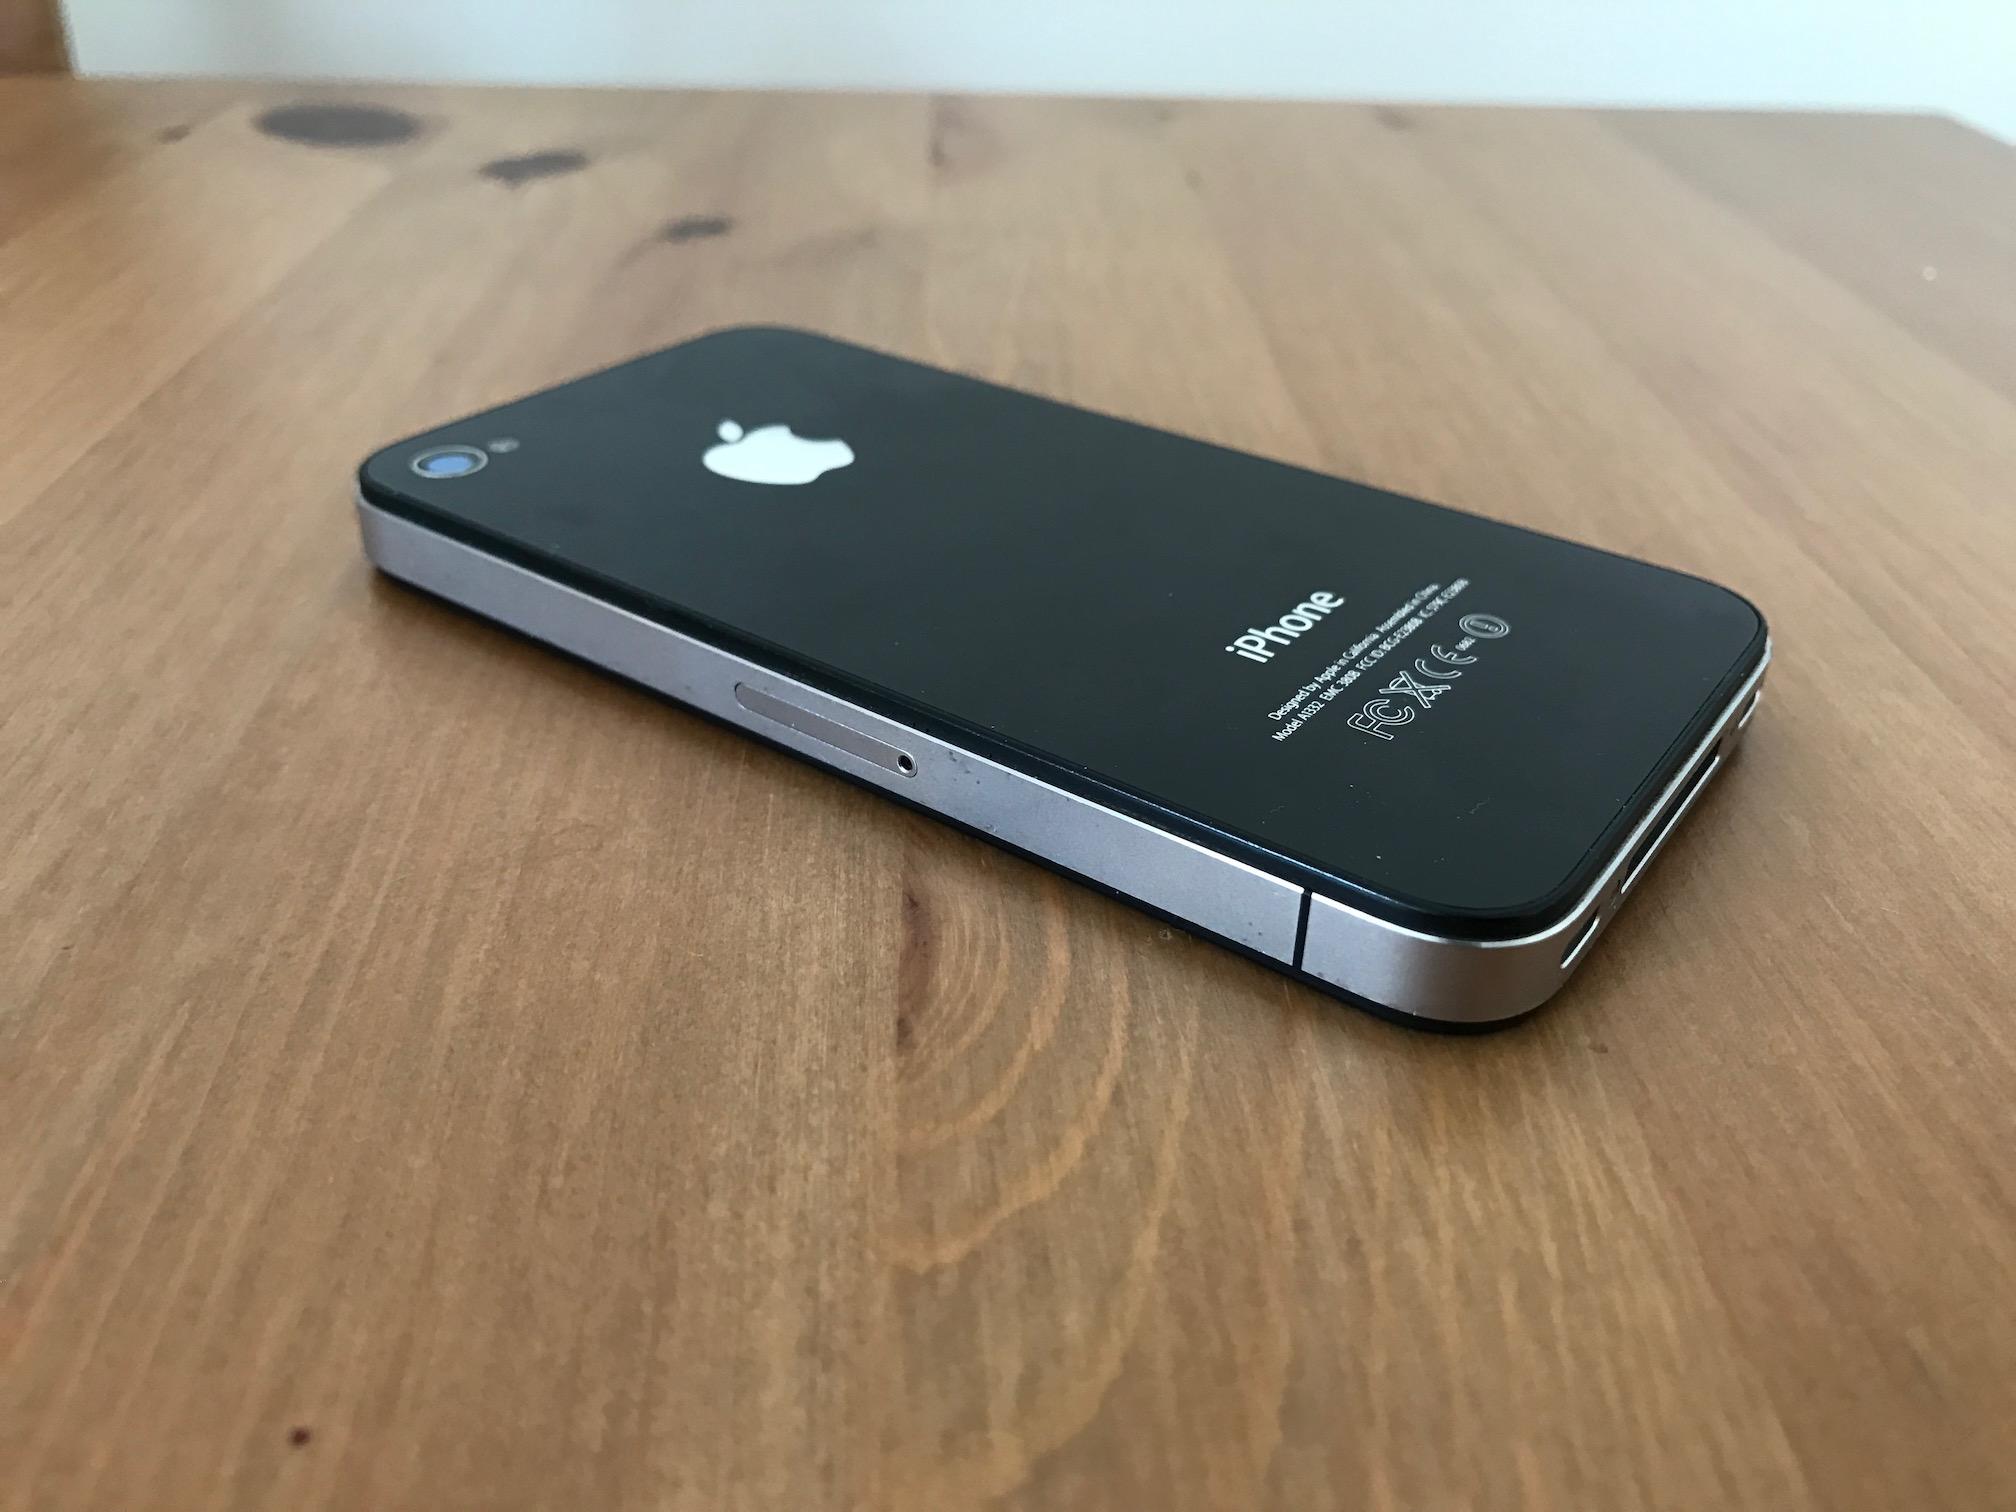 iphone-4-gsm-b.JPG